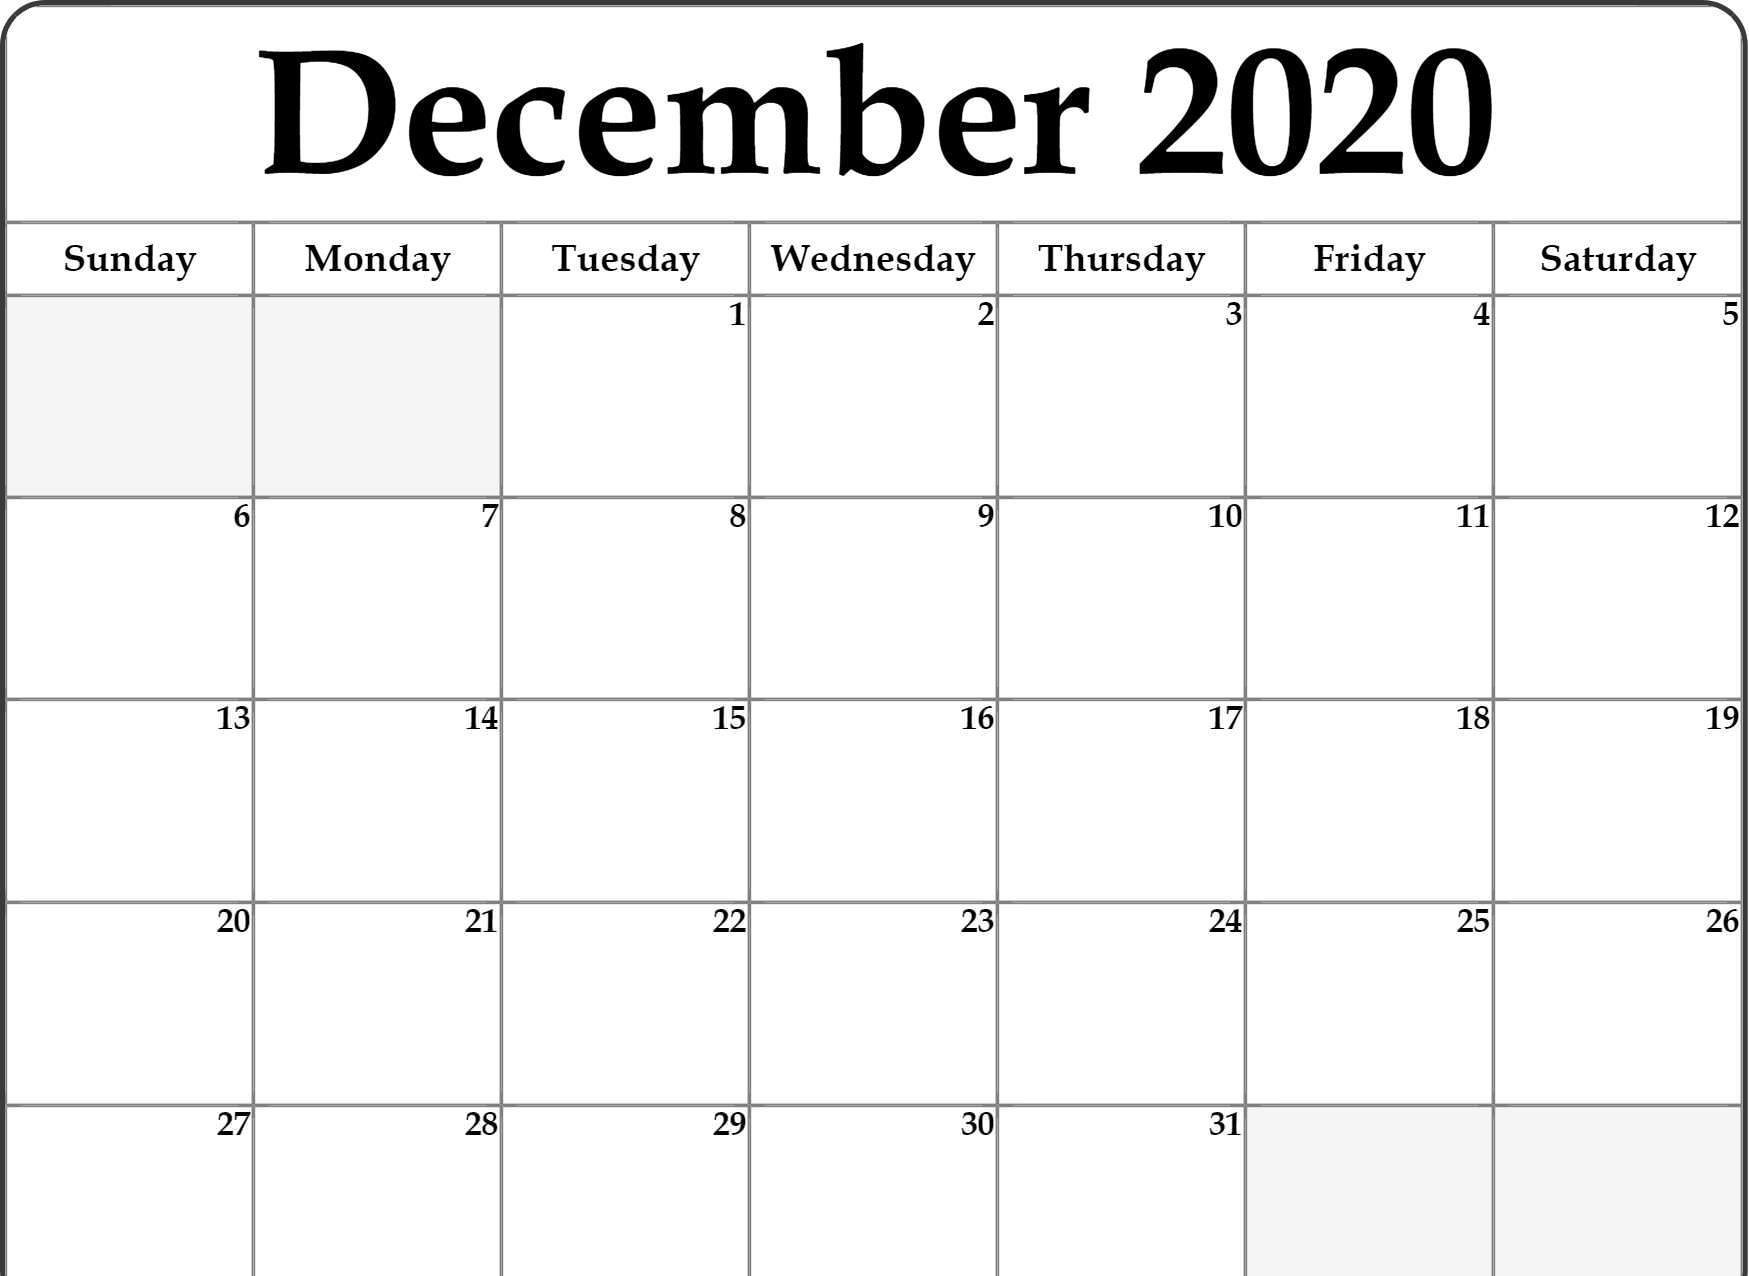 December 2020 Calendar Before Template with regard to Michel Zbinden December 2020